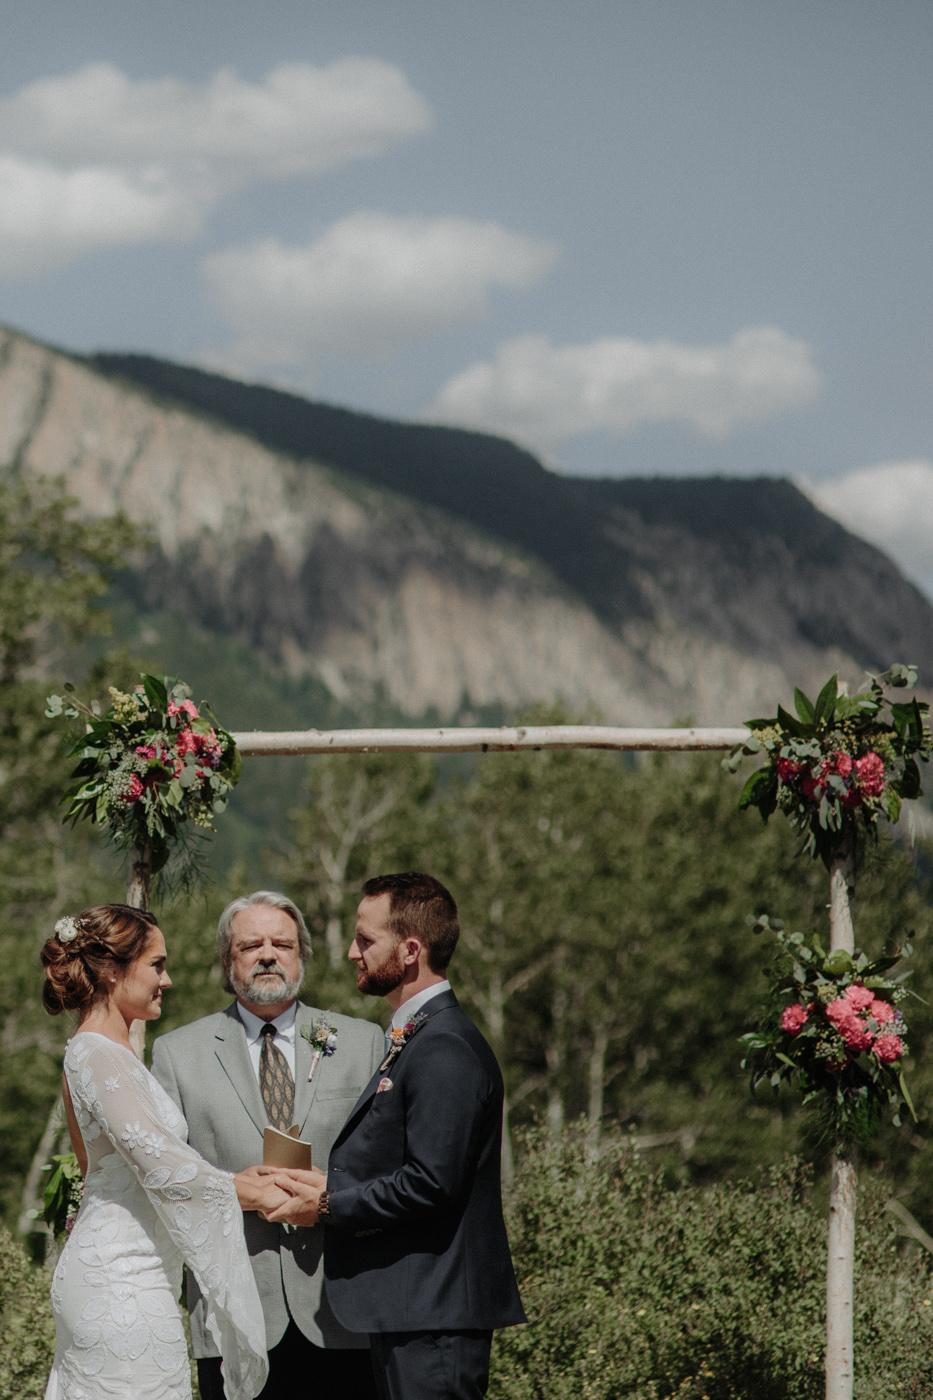 woods-walk-trail-crested-butte-colorado-wedding-44.jpg